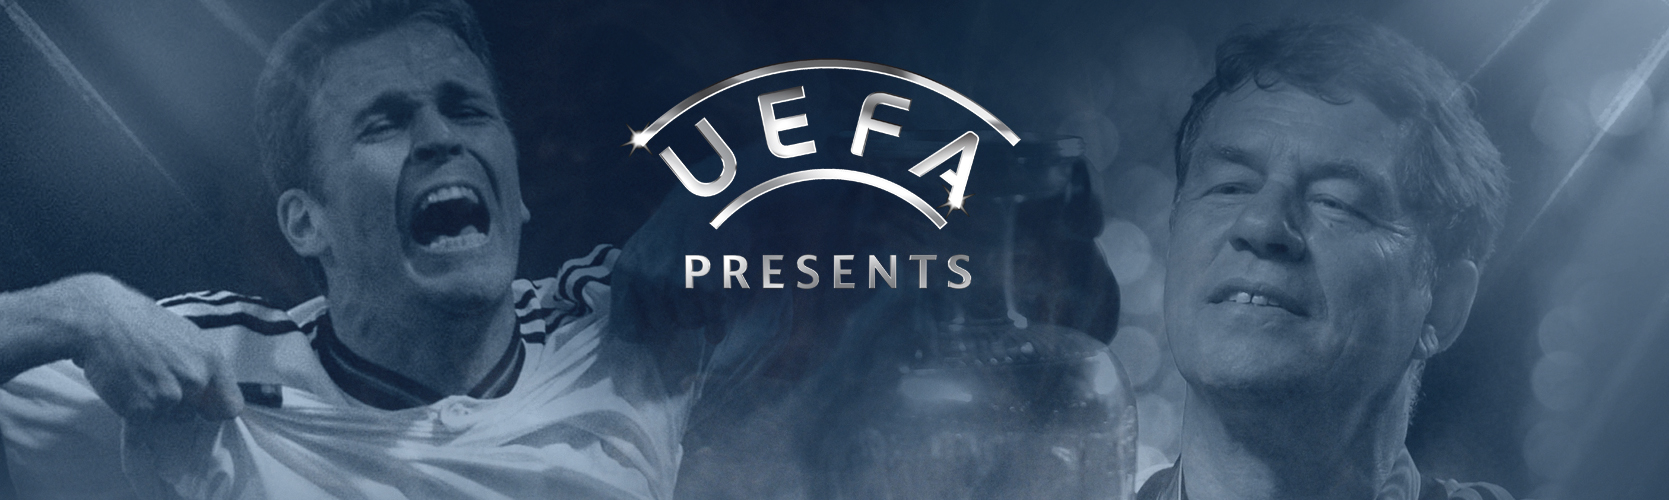 UEFA EURO – Die offizielle Chronik